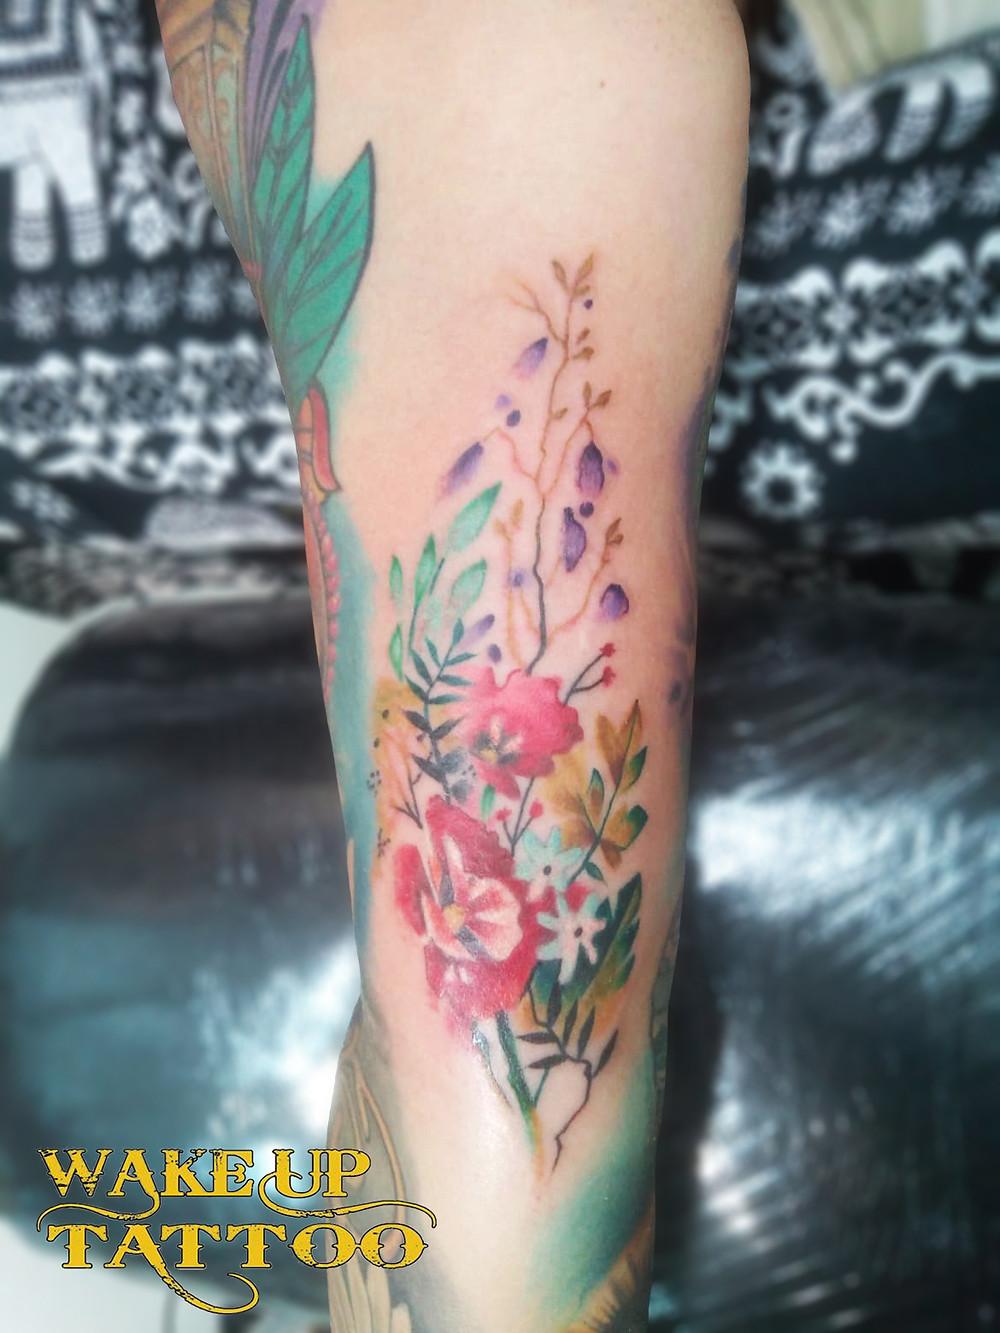 Flower tattoo by Wake up Tattoo Phuket at Patong Beach